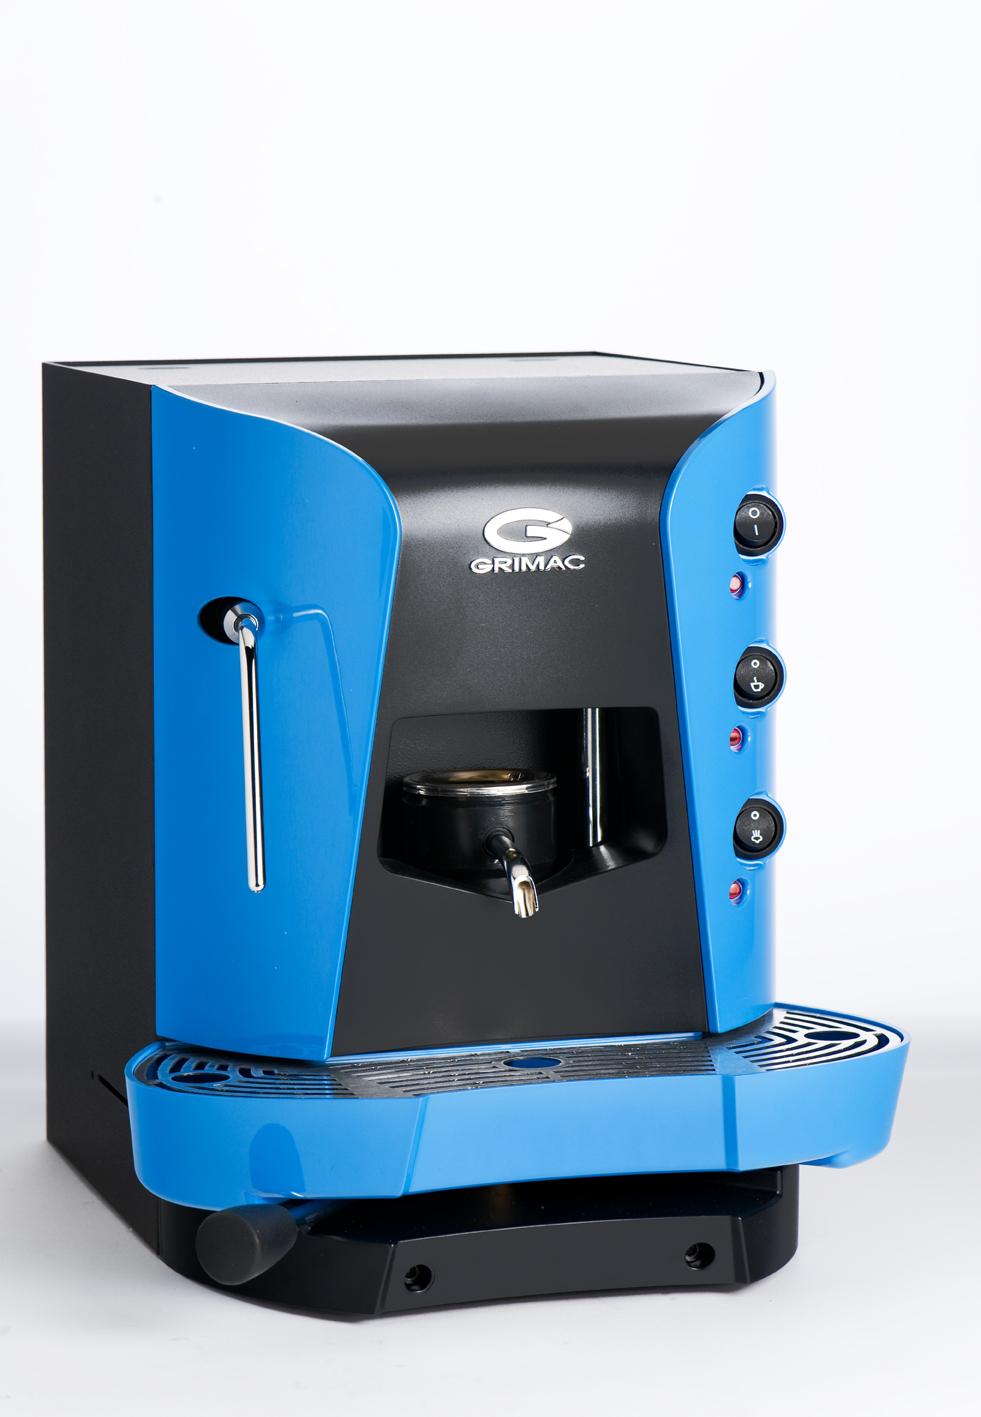 office domestic espresso coffee machines ese coffee pods. Black Bedroom Furniture Sets. Home Design Ideas